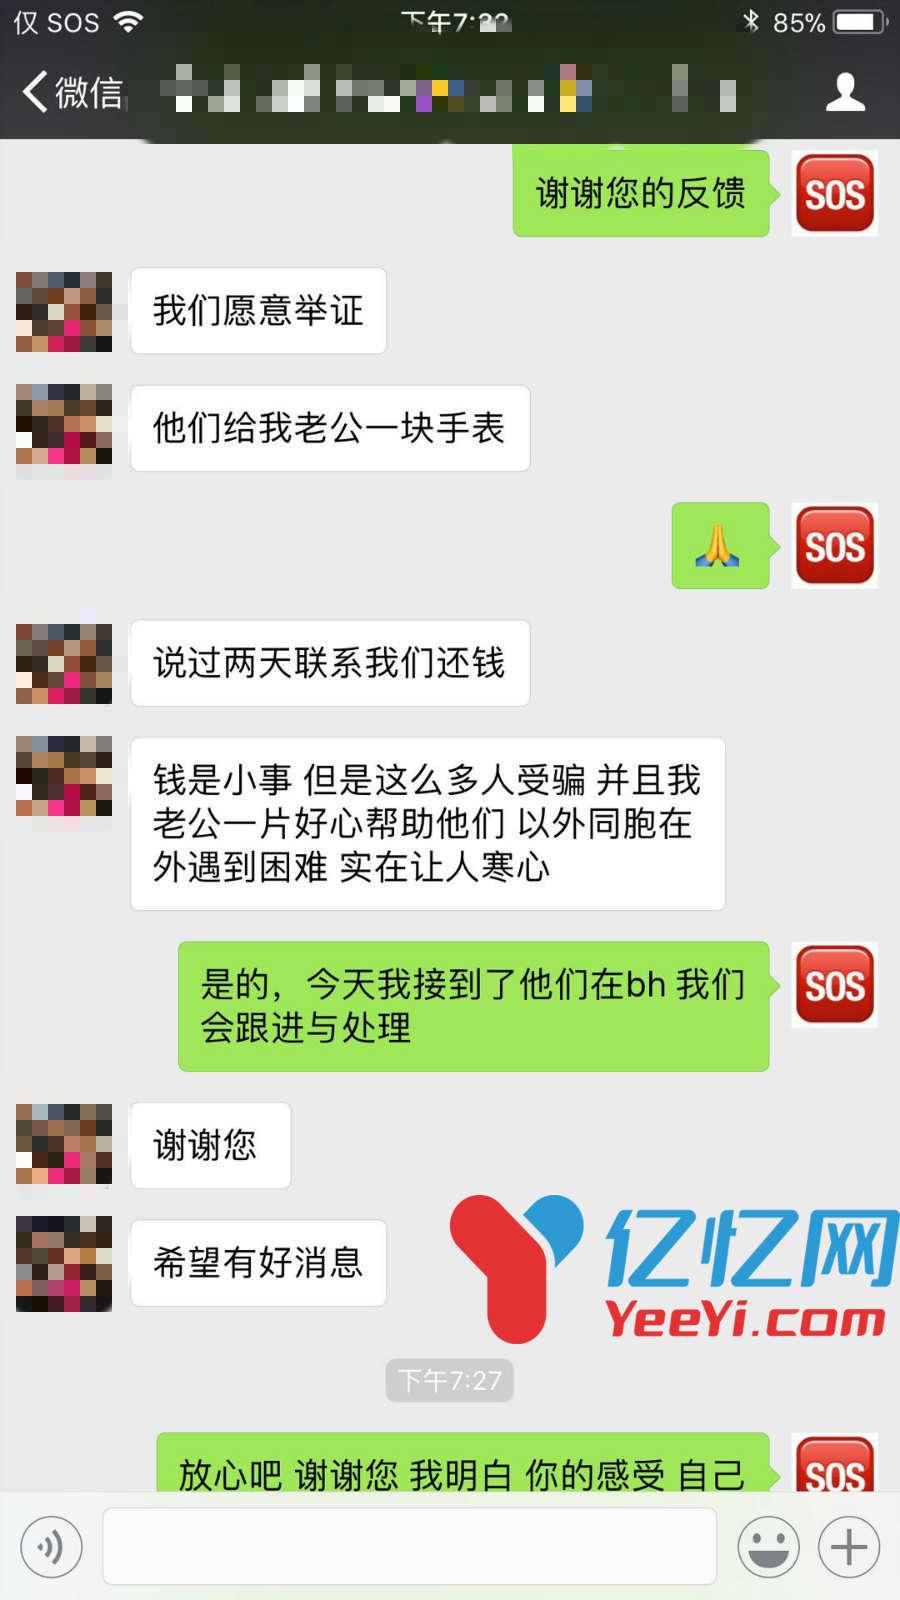 WeChat Image_20180705081735_meitu_6.jpg?x-oss-process=image/format,png